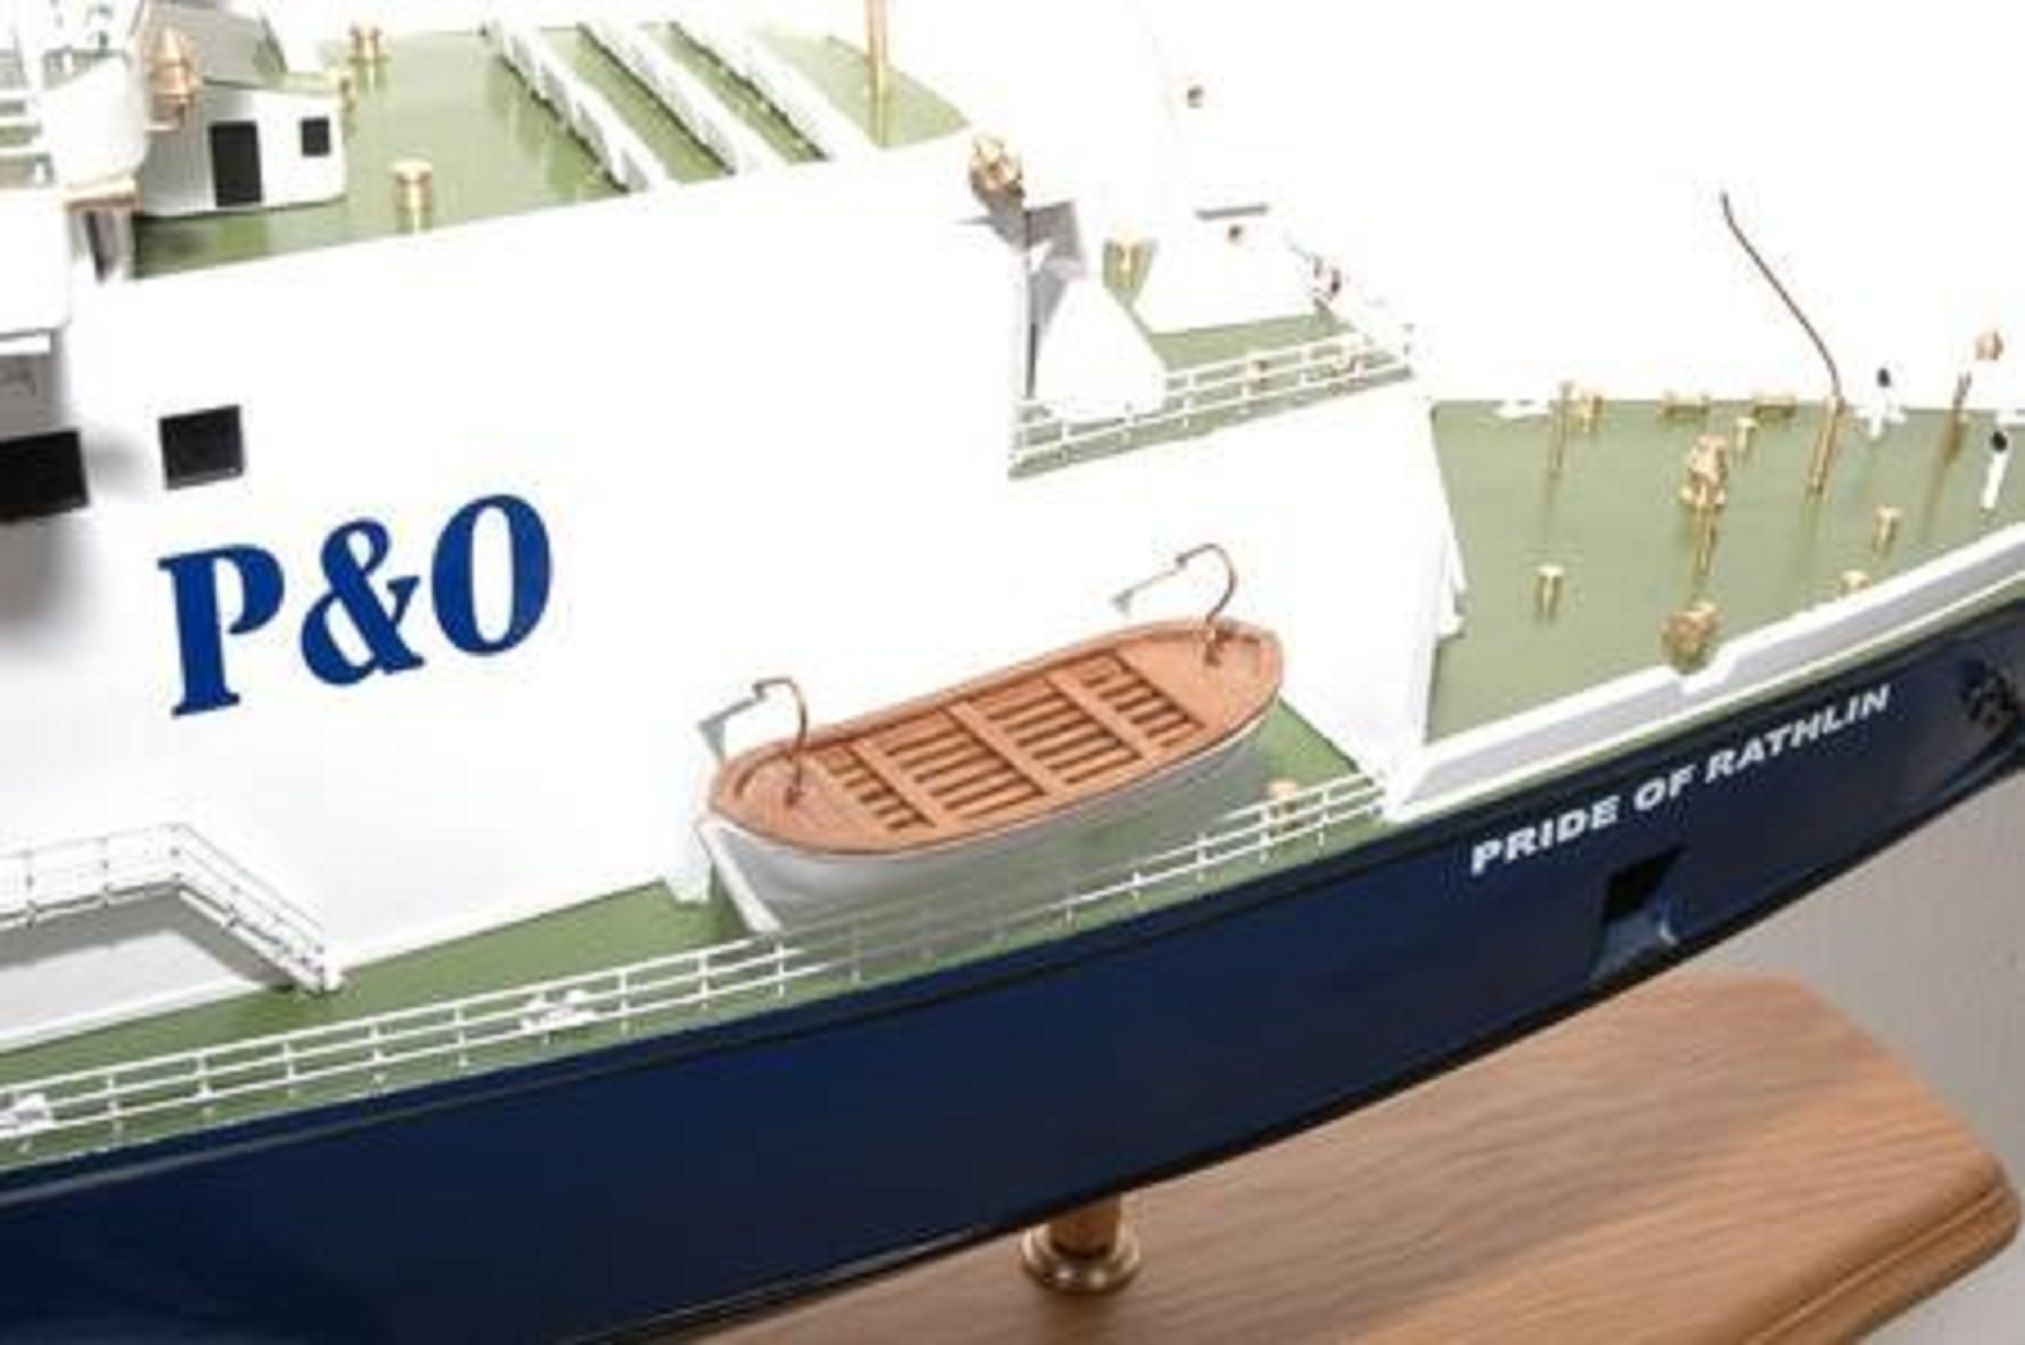 293-7550-P-O-model-ships-Pride-Aisla-and-Rathlin-Premier-Range